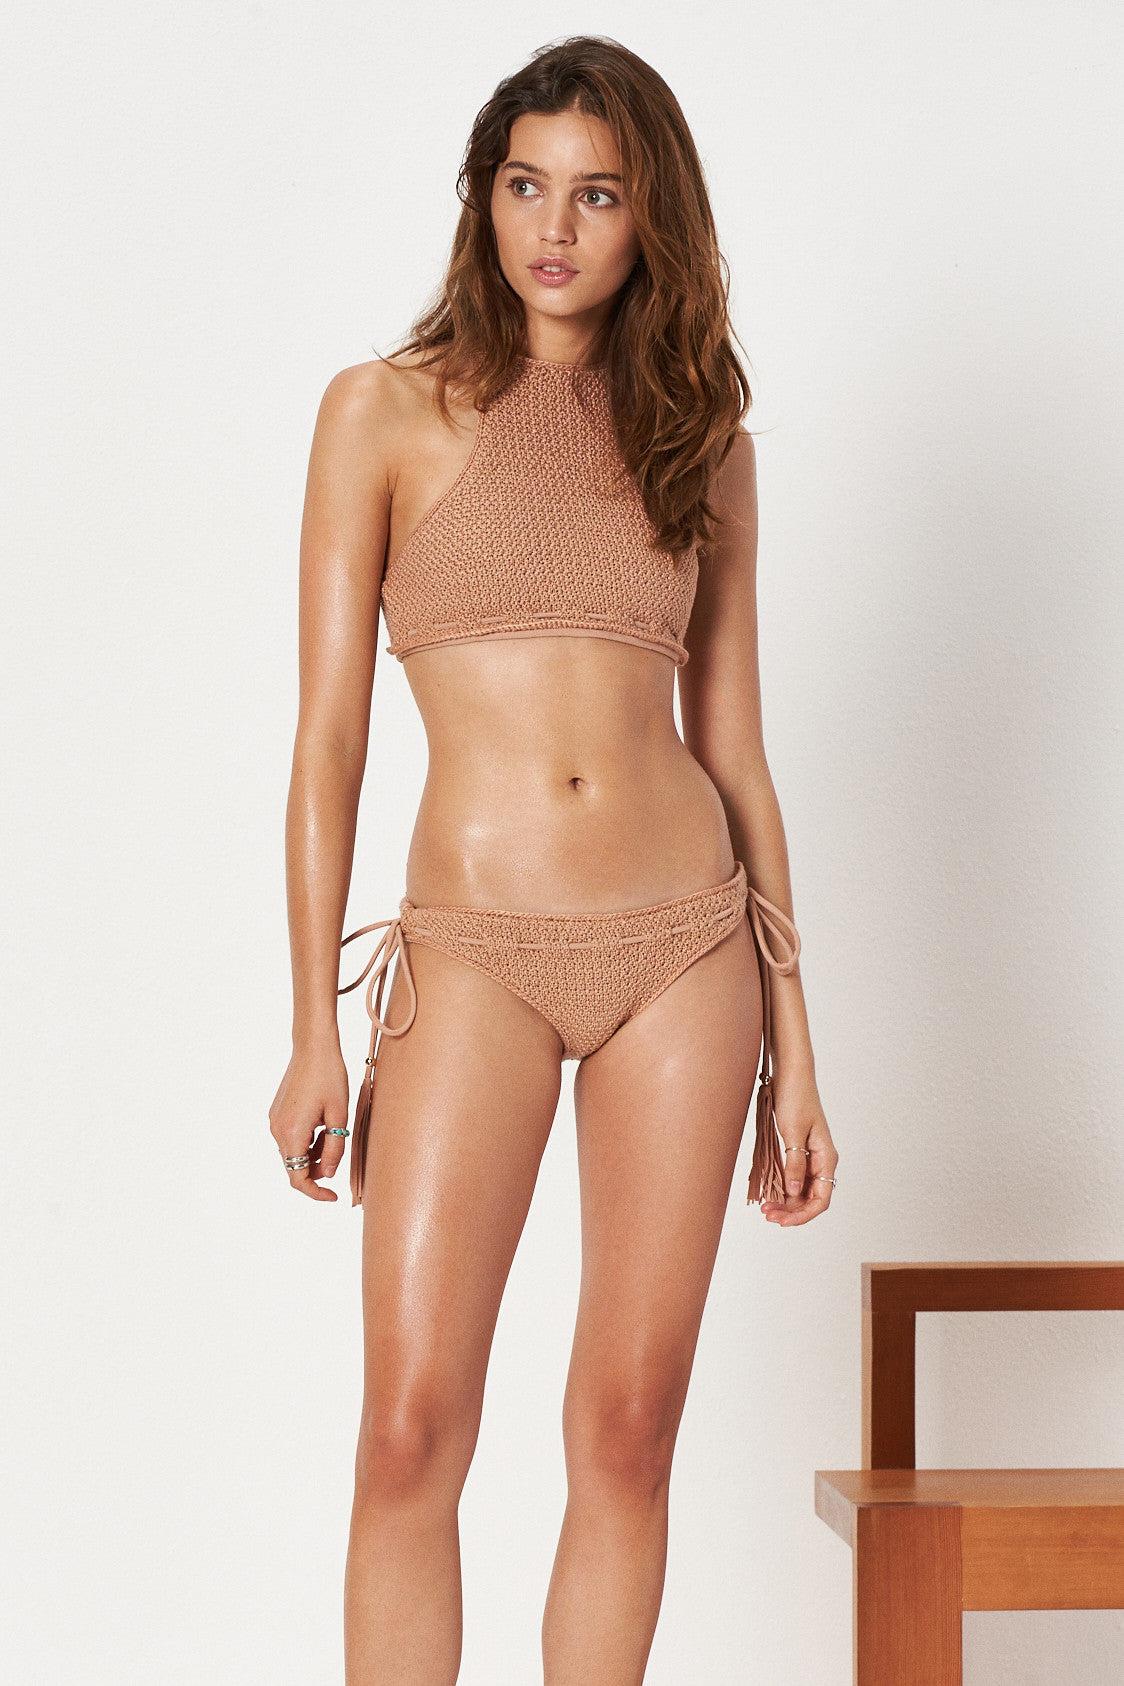 full nude boobs strip